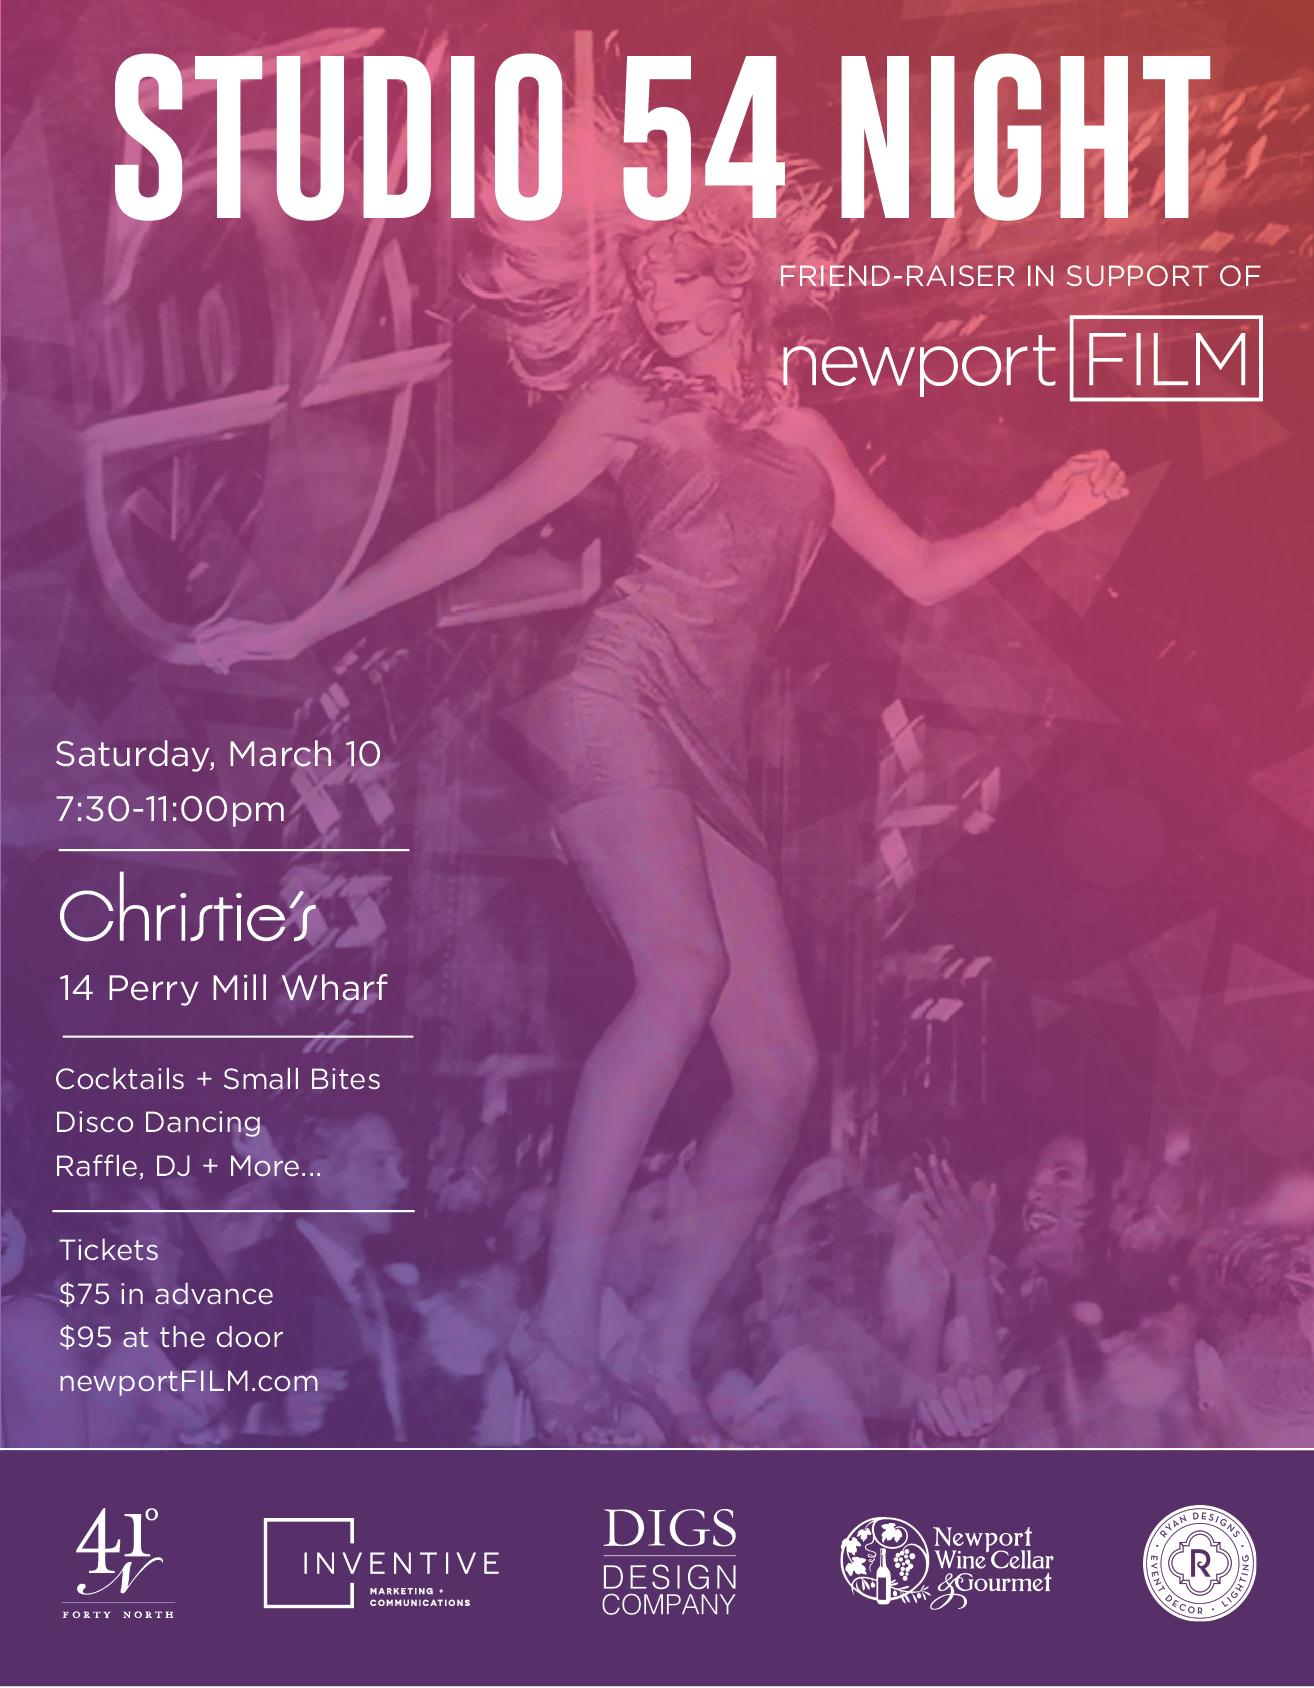 Studio 54 Invite (for digital)-01.png